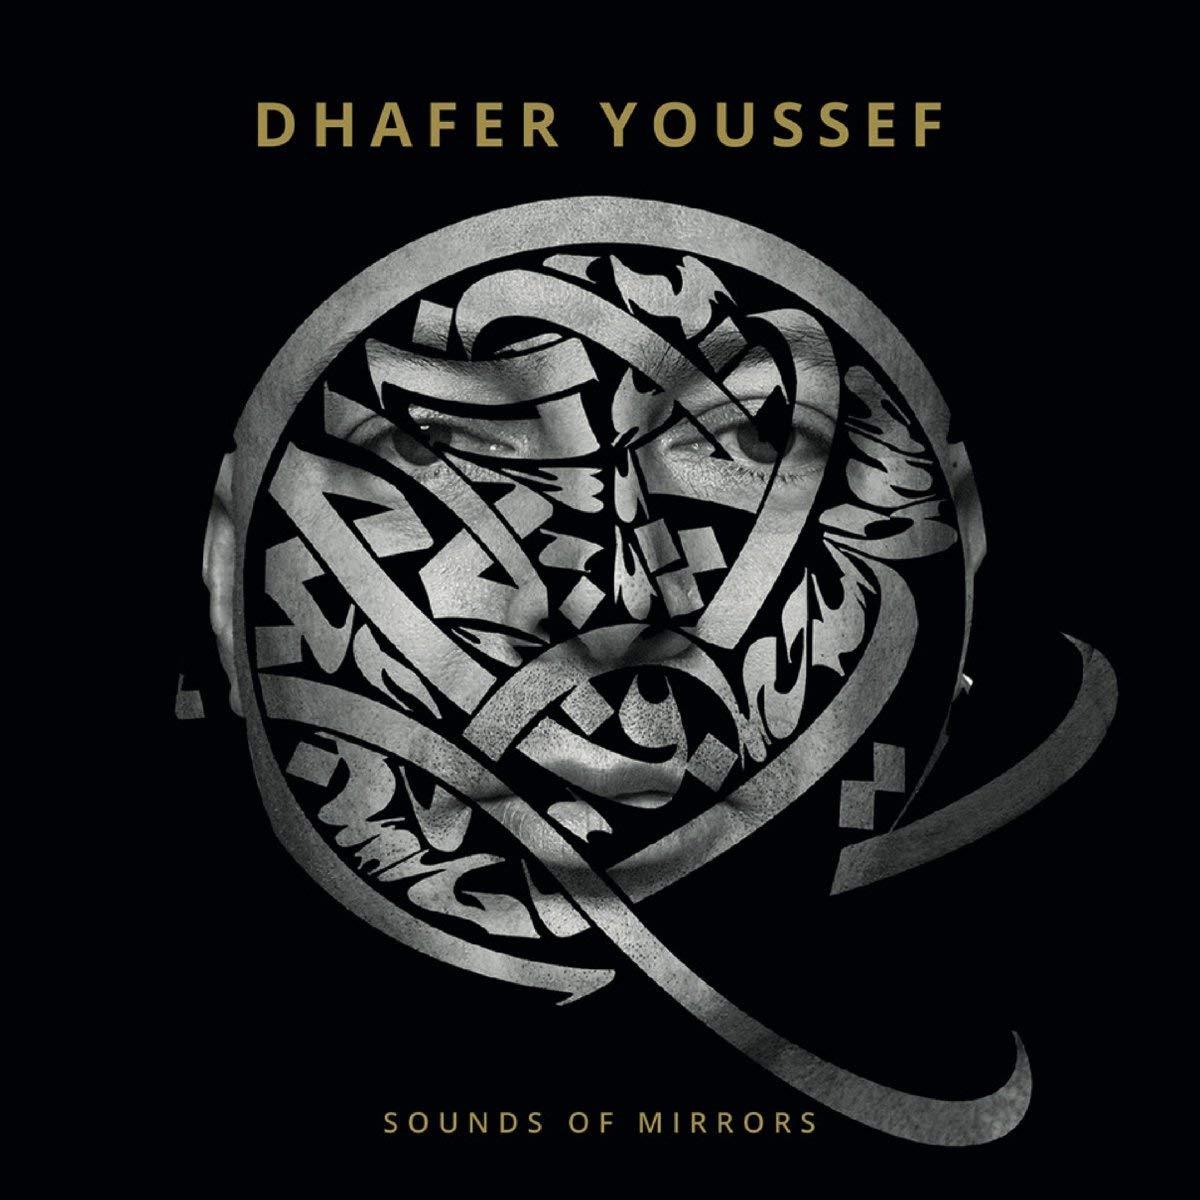 Sounds of mirror Dhafer Youssef, oud & chant Eivind Aarset, guitare & arrangements Hüsnü Senlendirici, clarinette Zakir Hussain, tabla & percussions